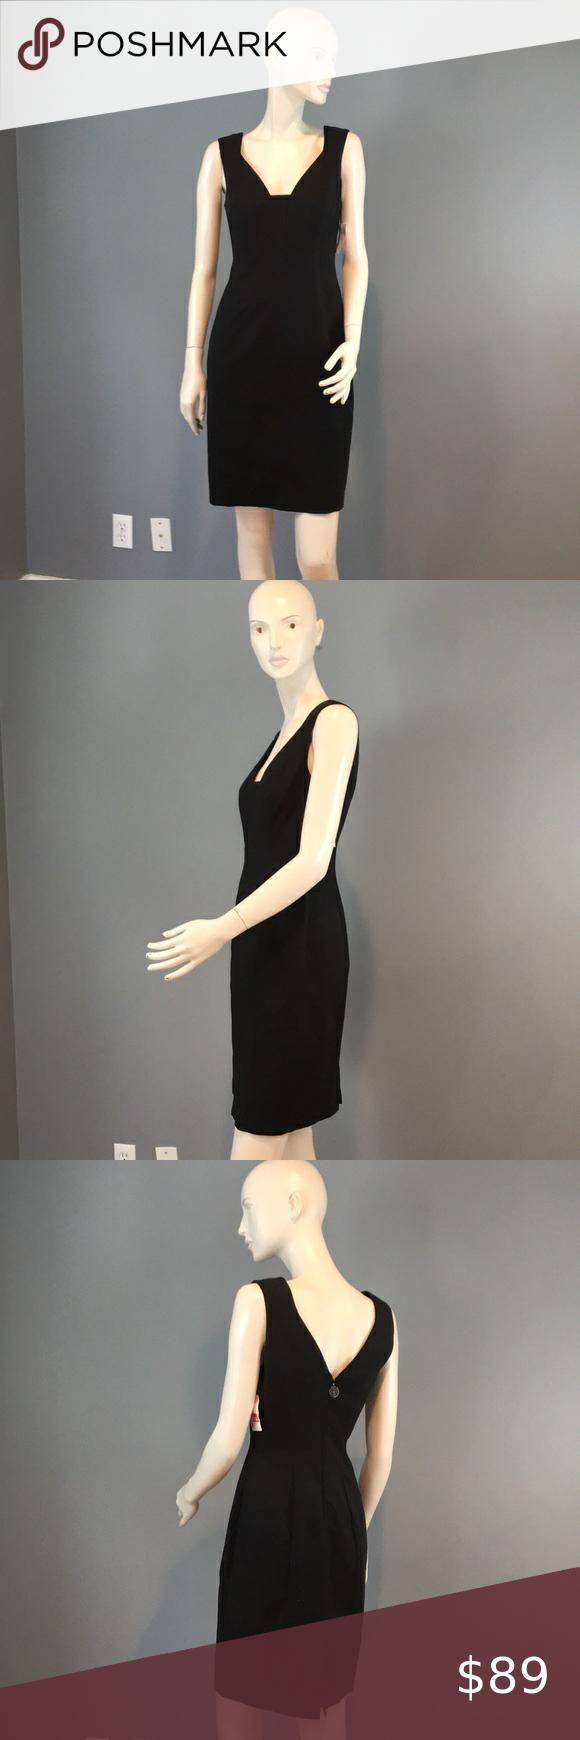 Nwot Elie Tahari Sheath Black Dress Sz 2 Lace Tank Dress Long Sleeve Shift Dress Blue Knit Dress [ 1740 x 580 Pixel ]